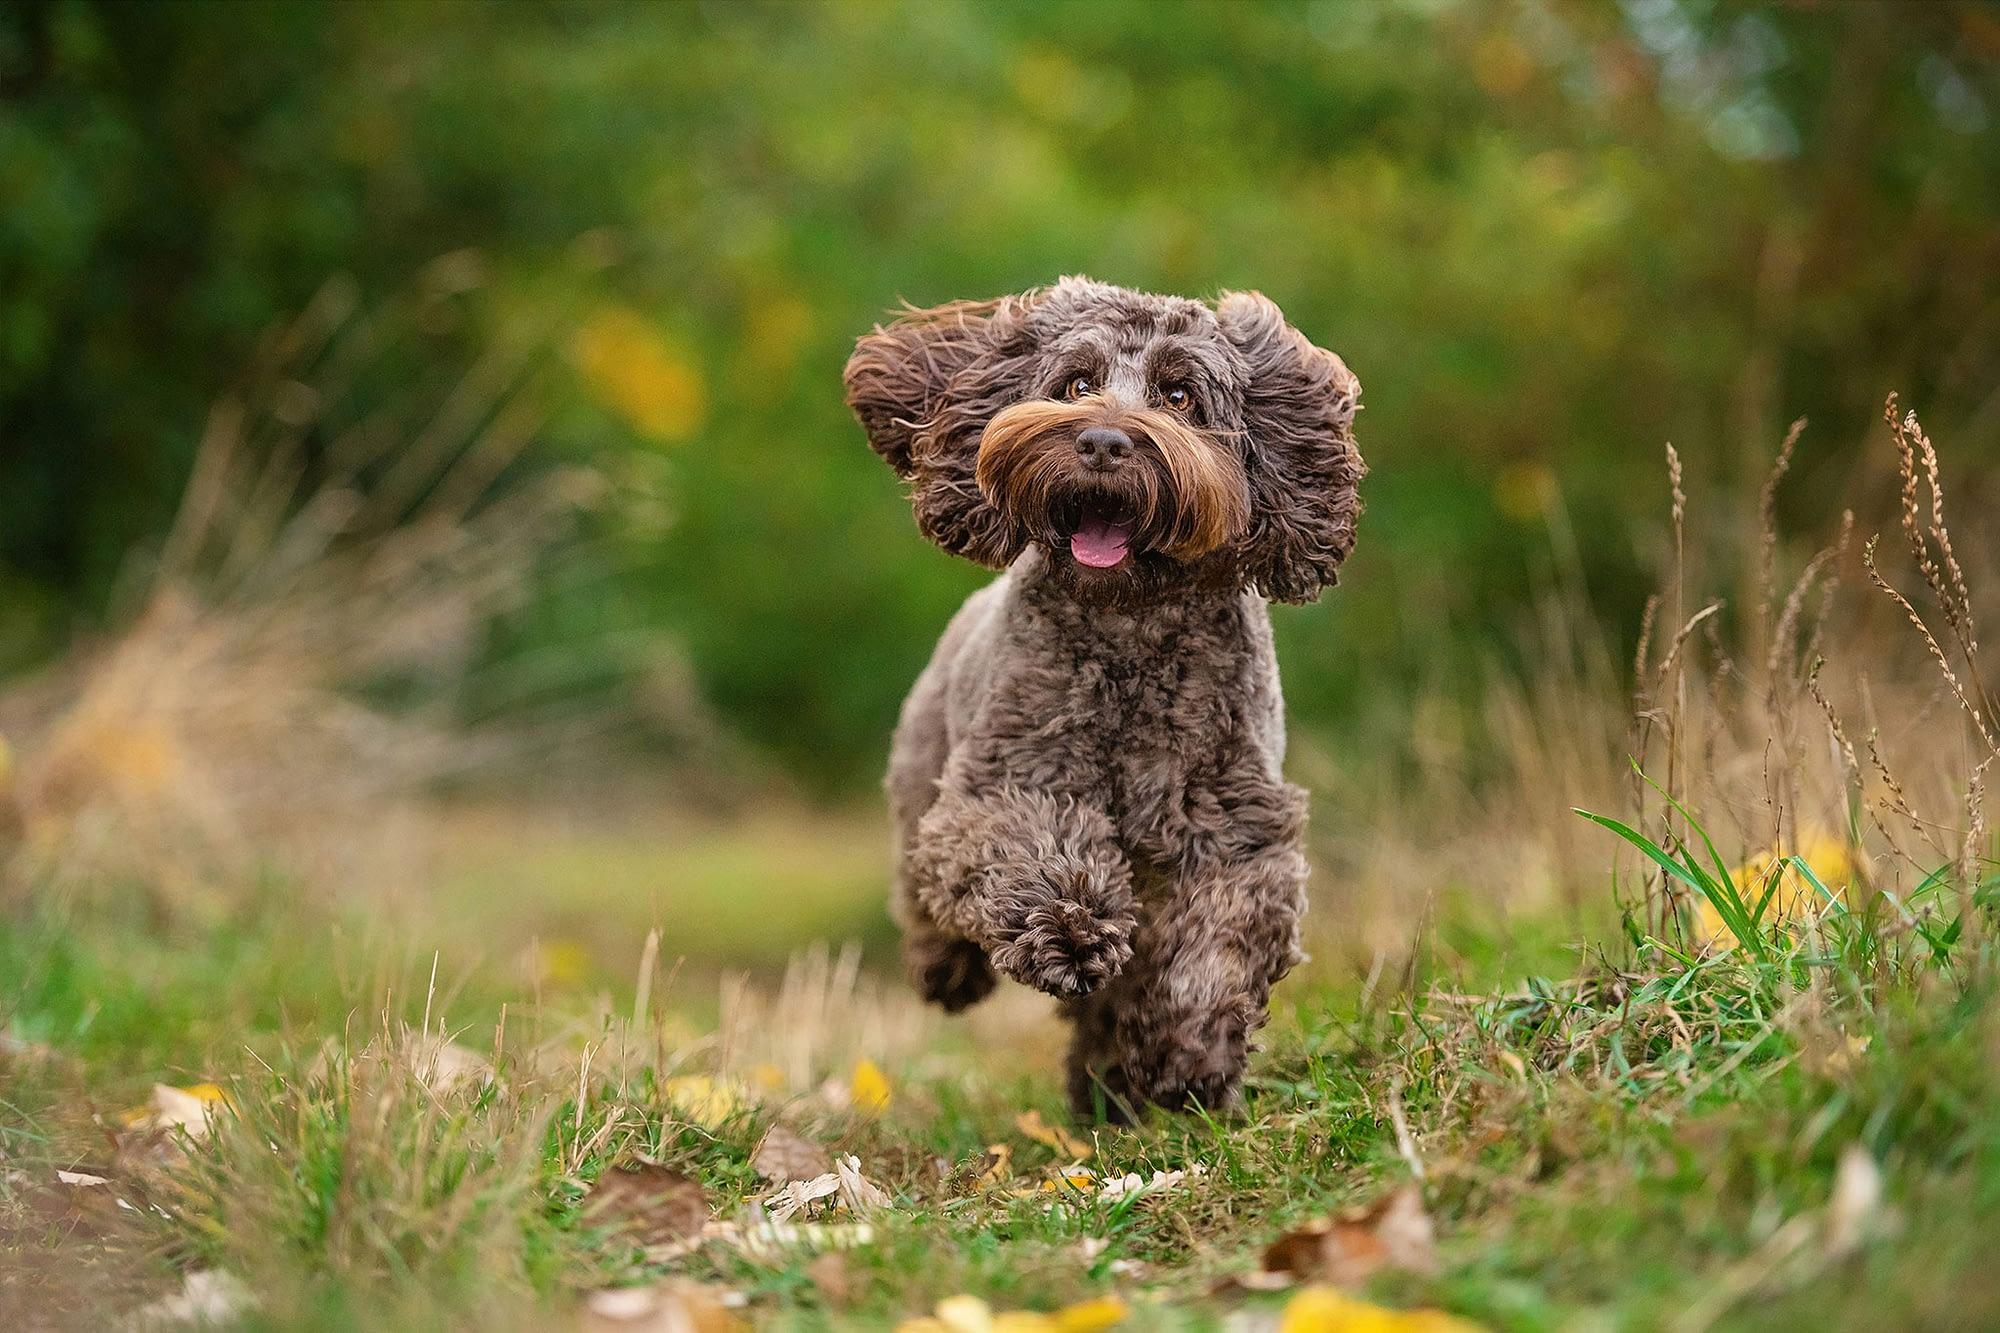 brown cockerpoo running in northampton field